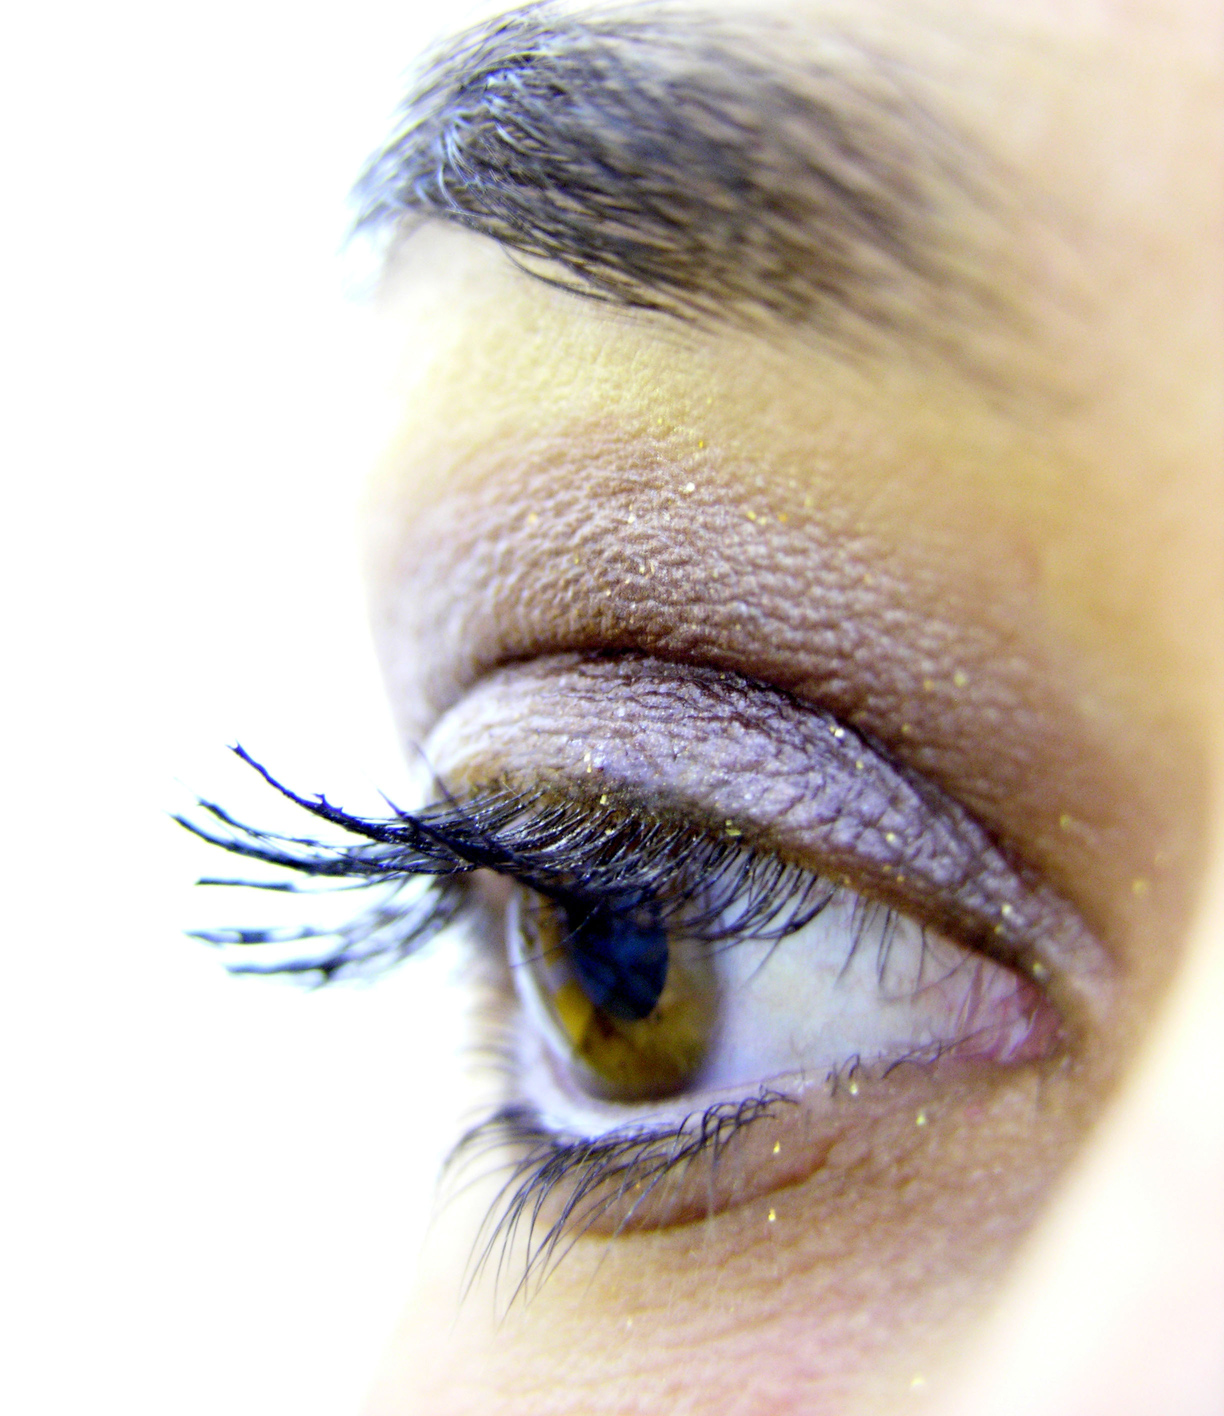 Depiction of Sombra de ojos